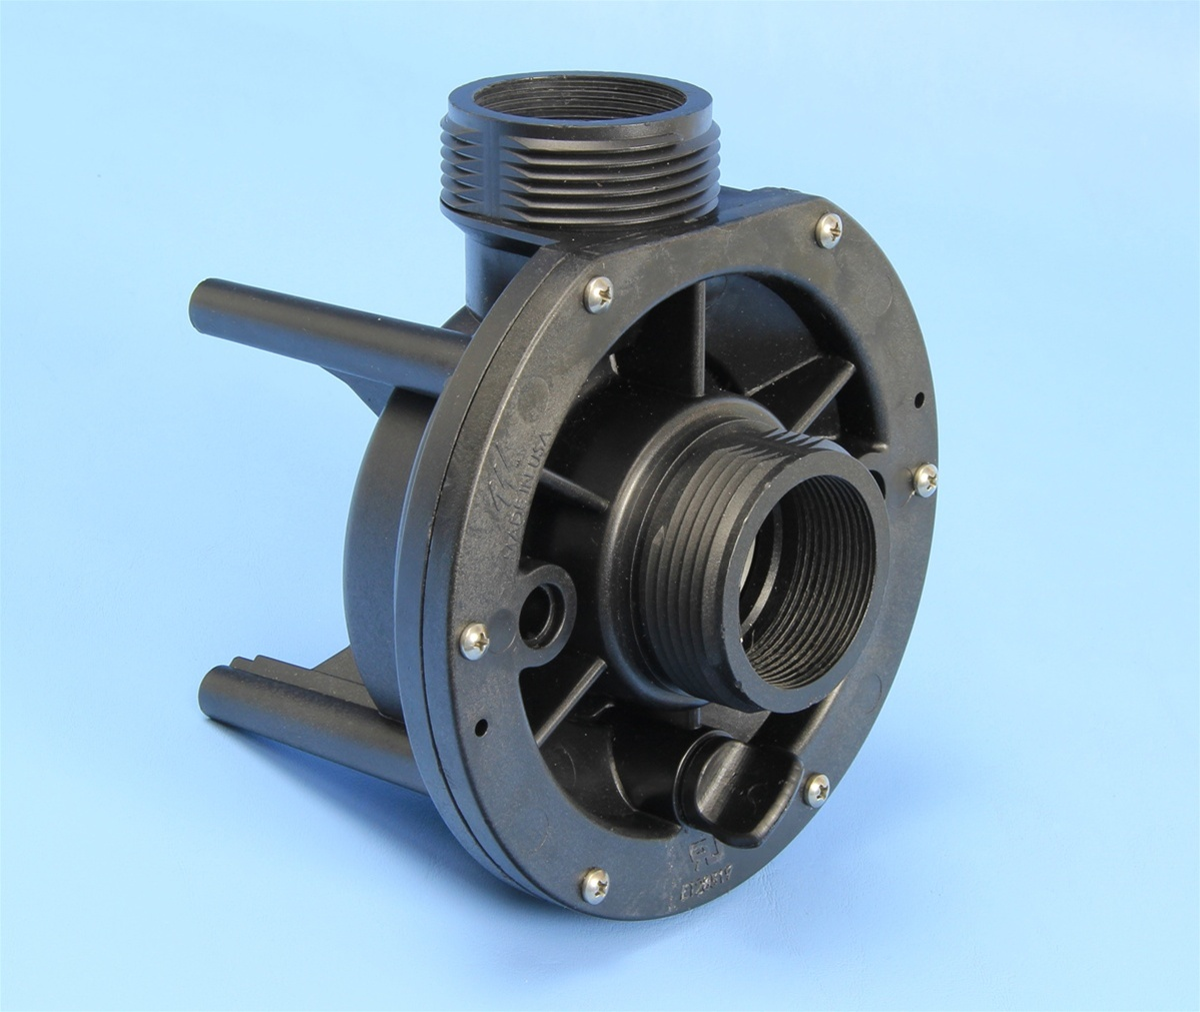 Waterway Pump Parts 310 1140 3101140 Wet End For Center